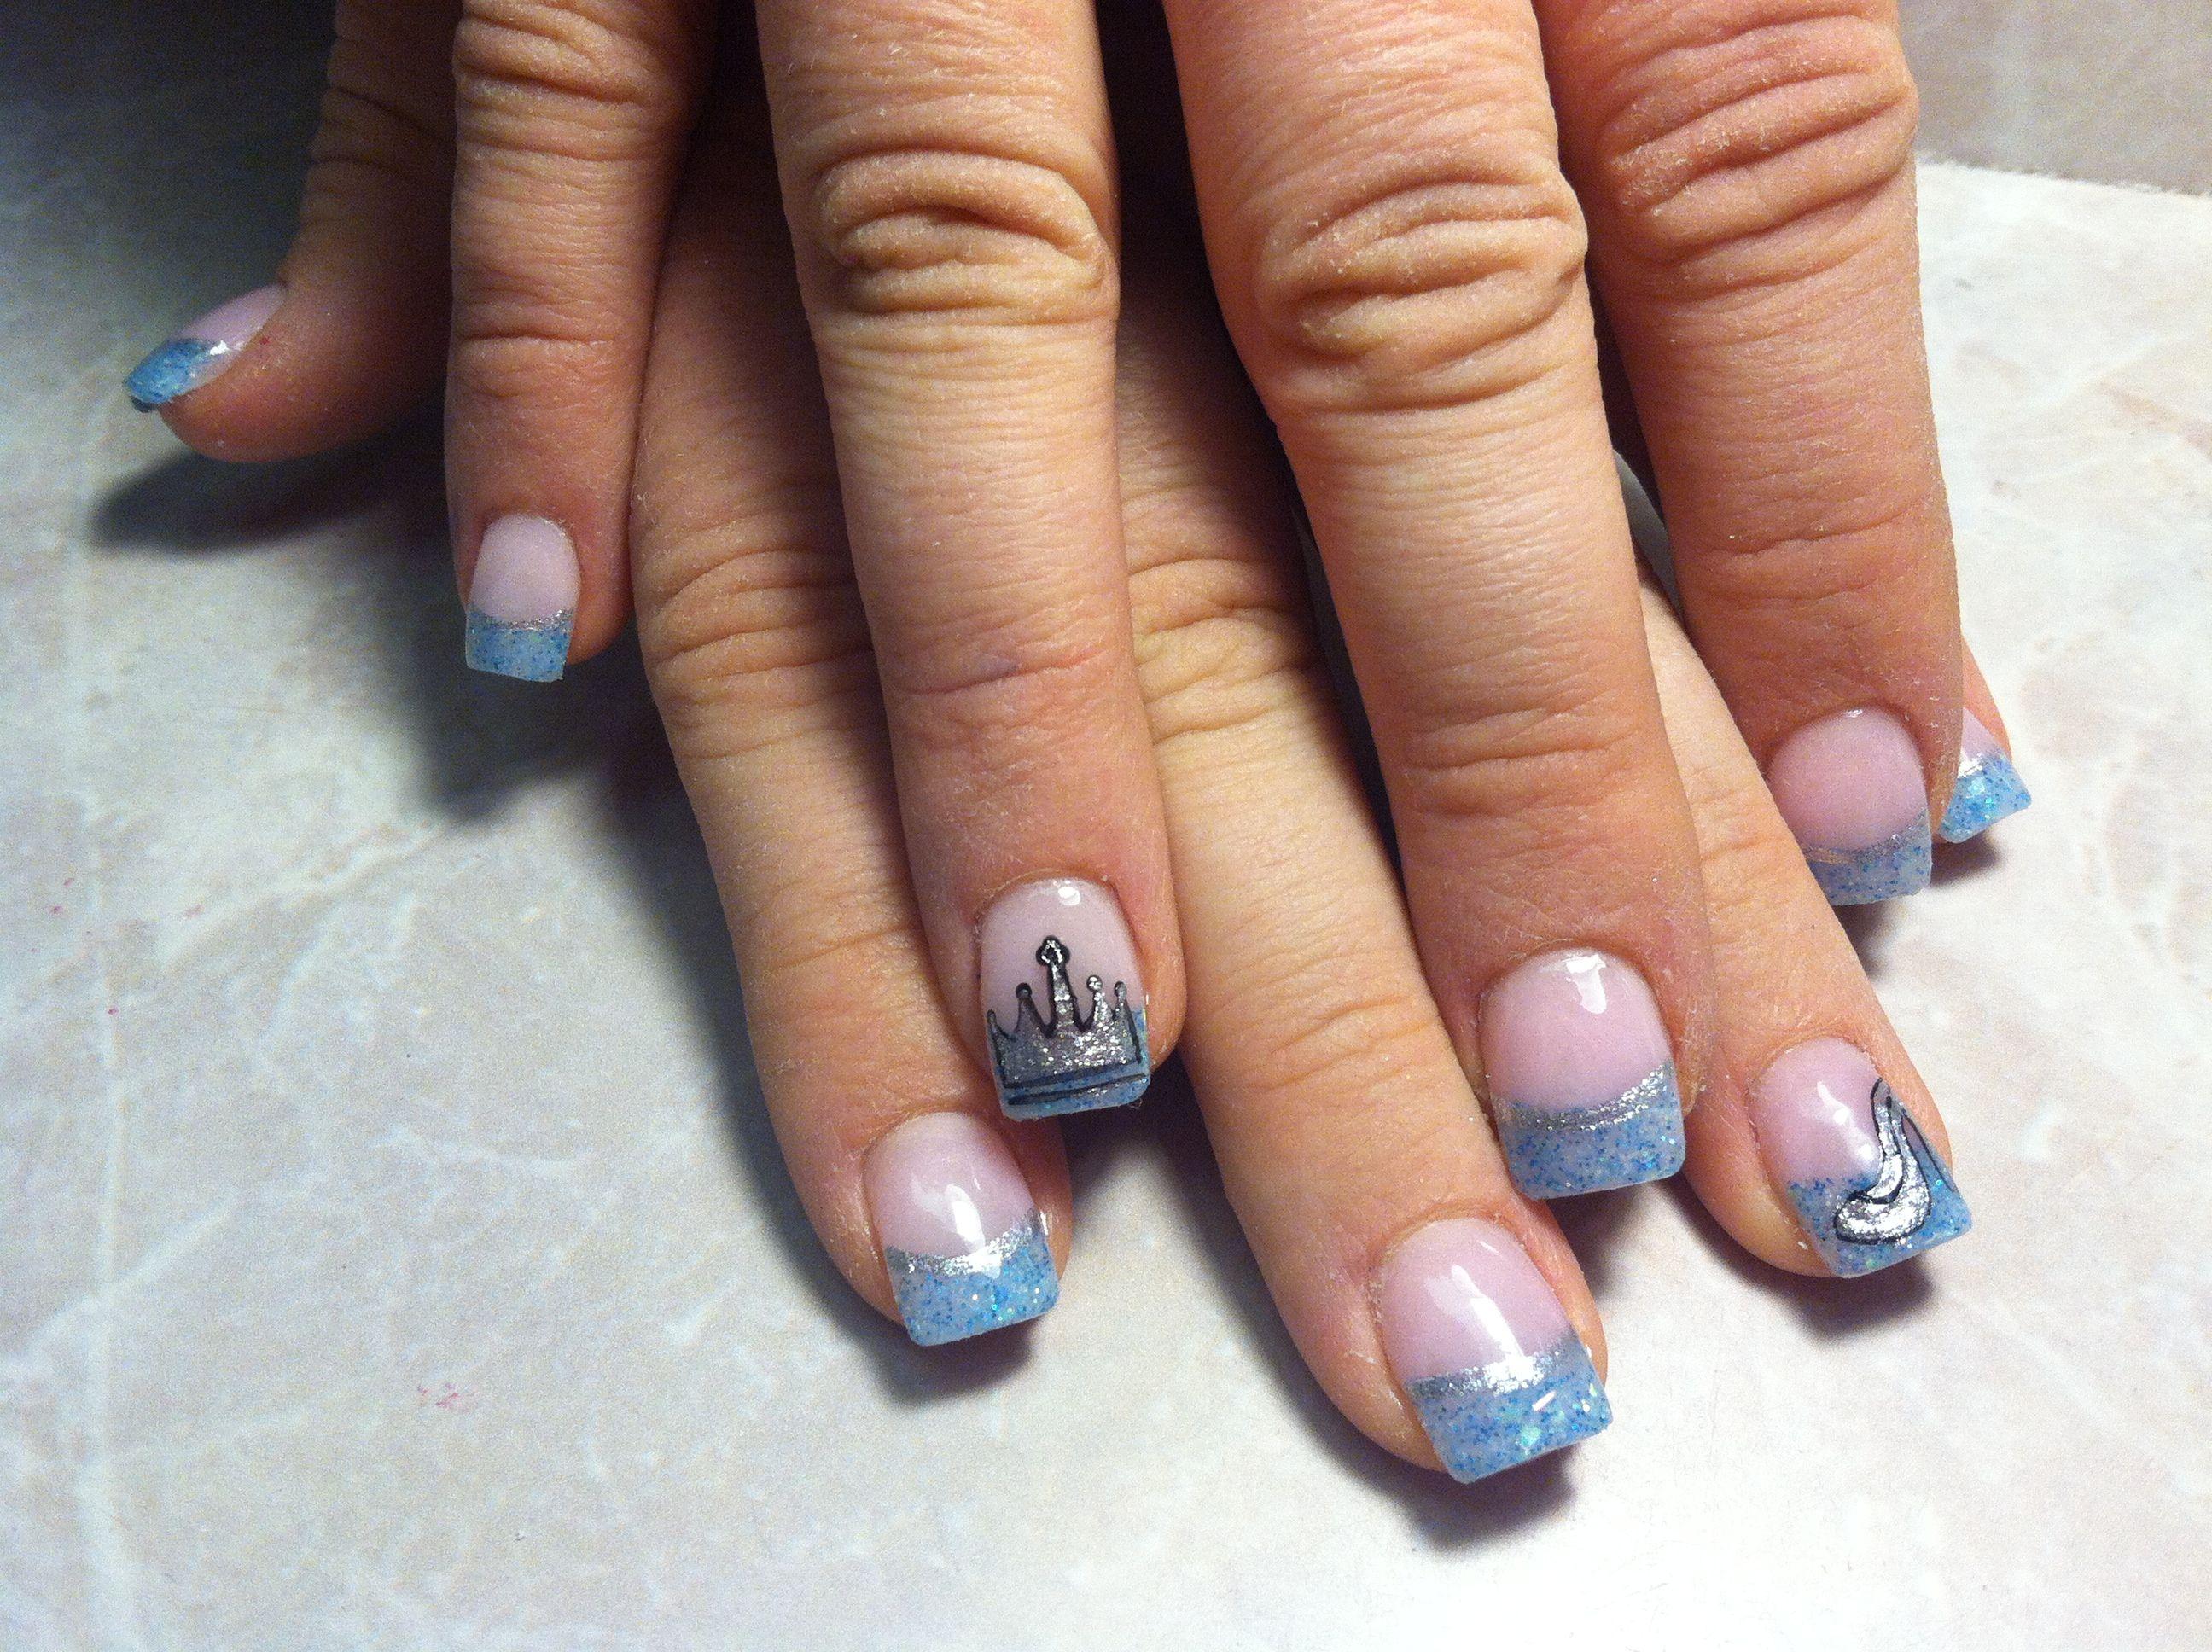 Cinderella Nail Art Done By Tiffany Stefan Nail Art